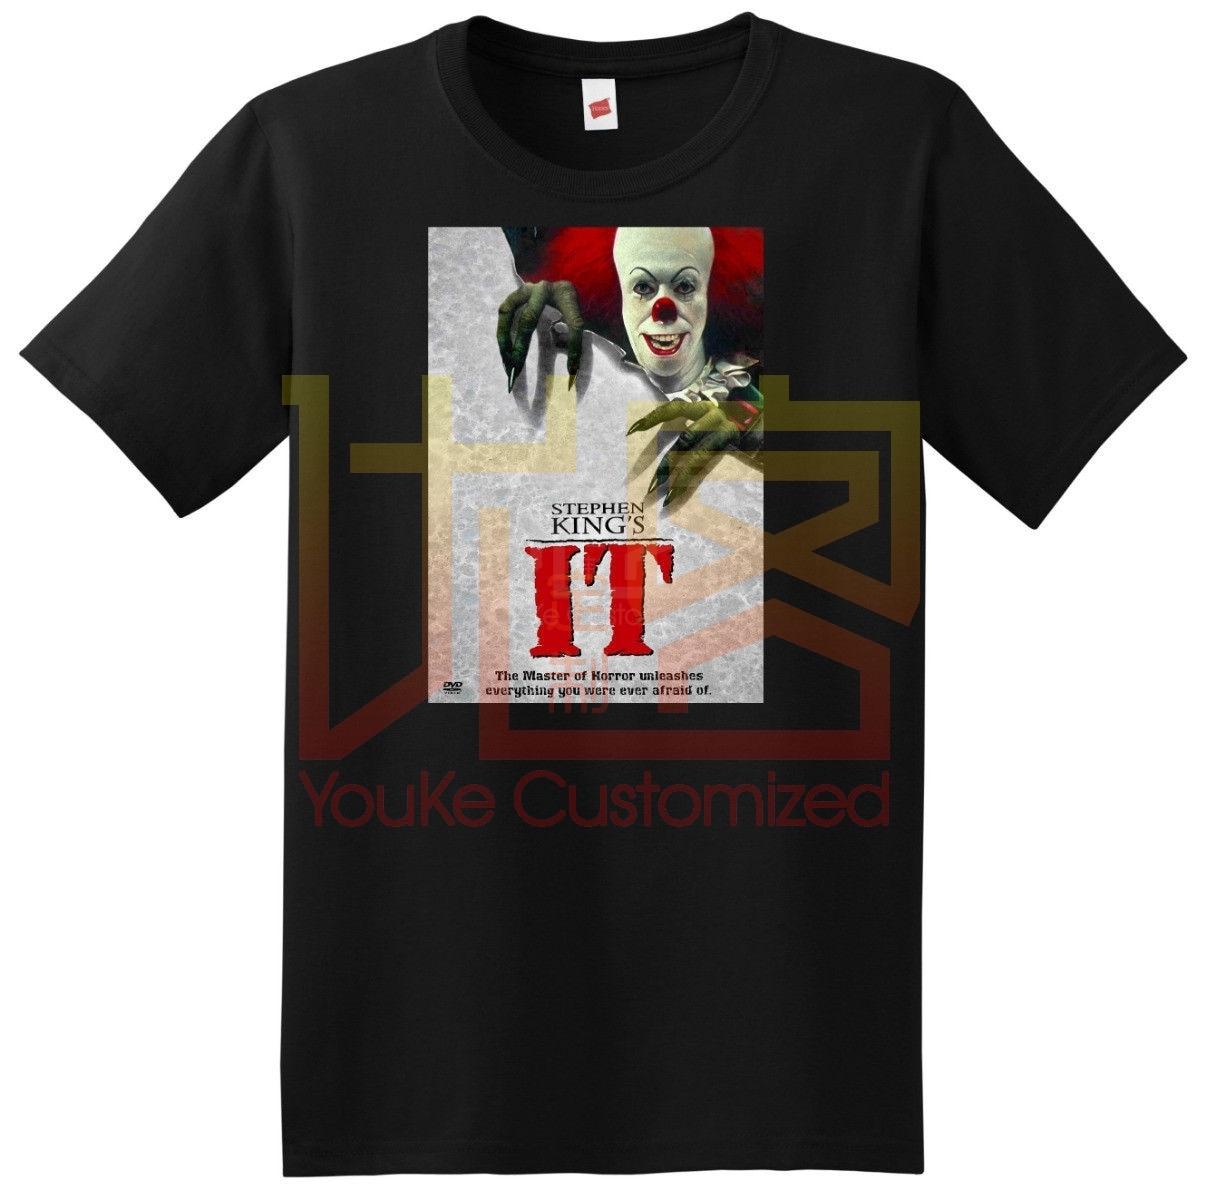 Pennywise de It camiseta 1990 película stephen king pequeña mediana grande